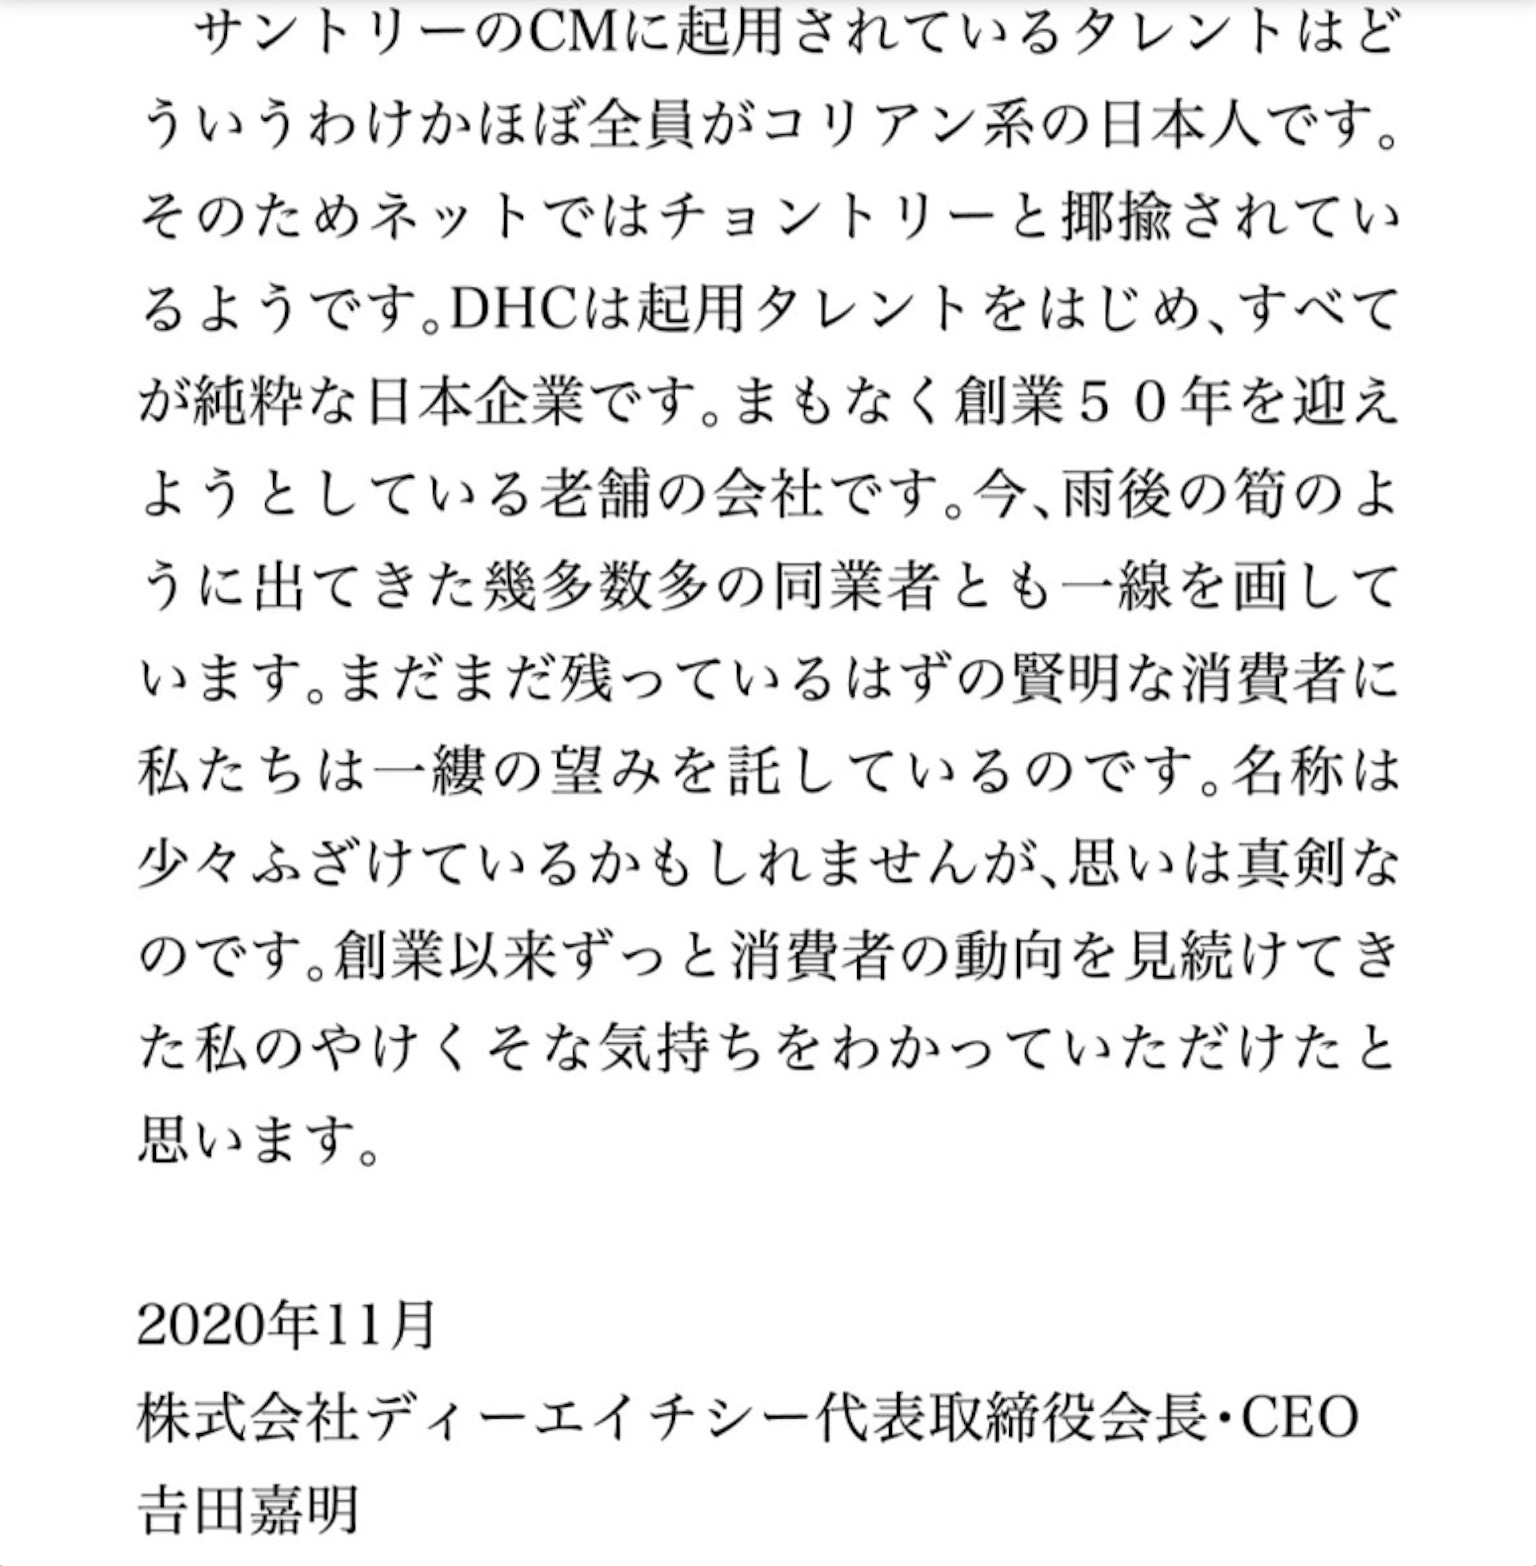 DHC文面